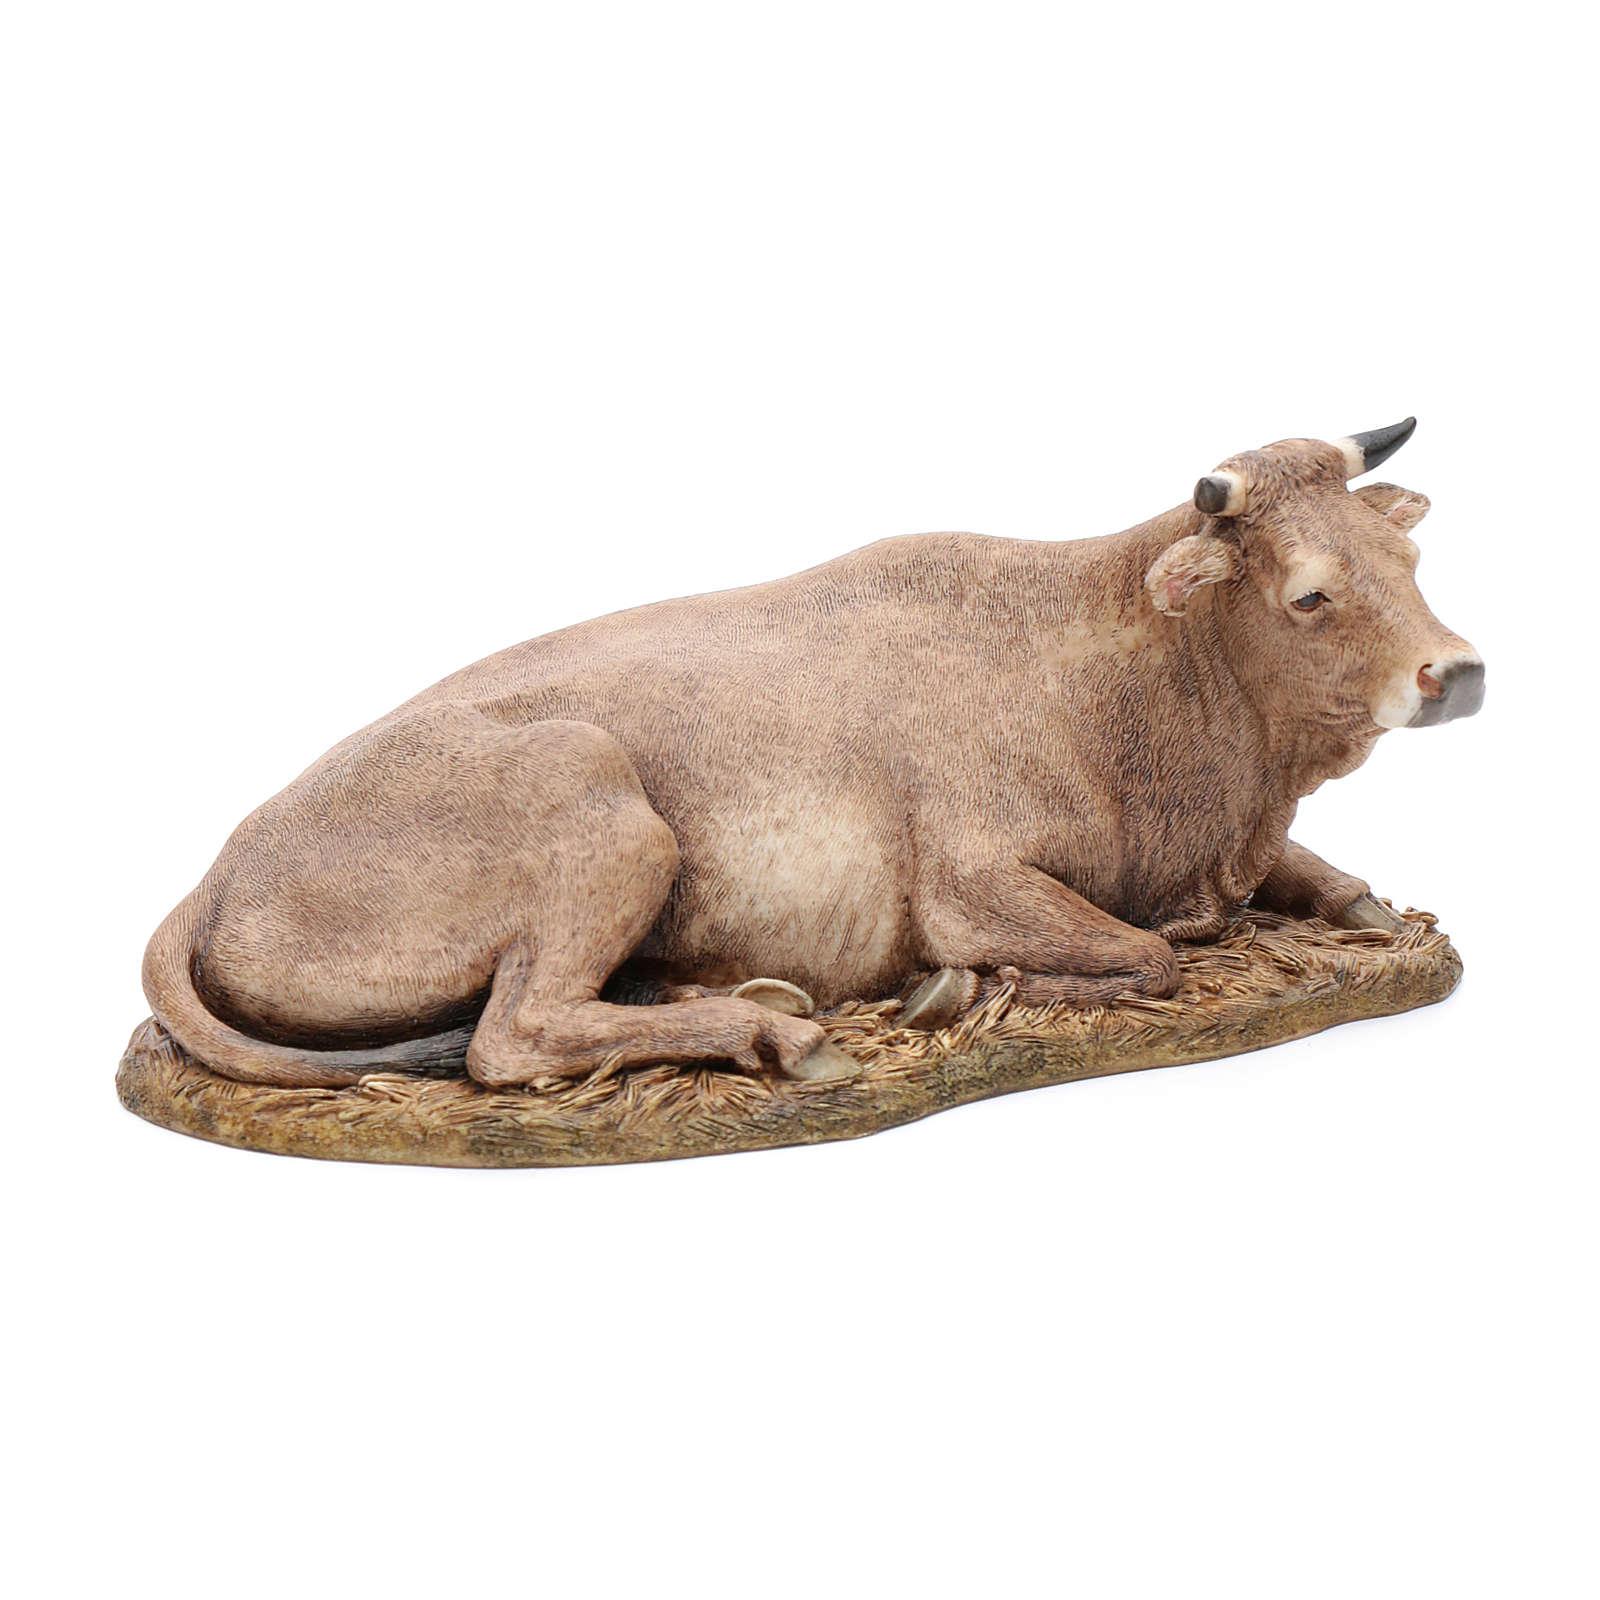 Ox statue in resin 20 cm Moranduzzo 4